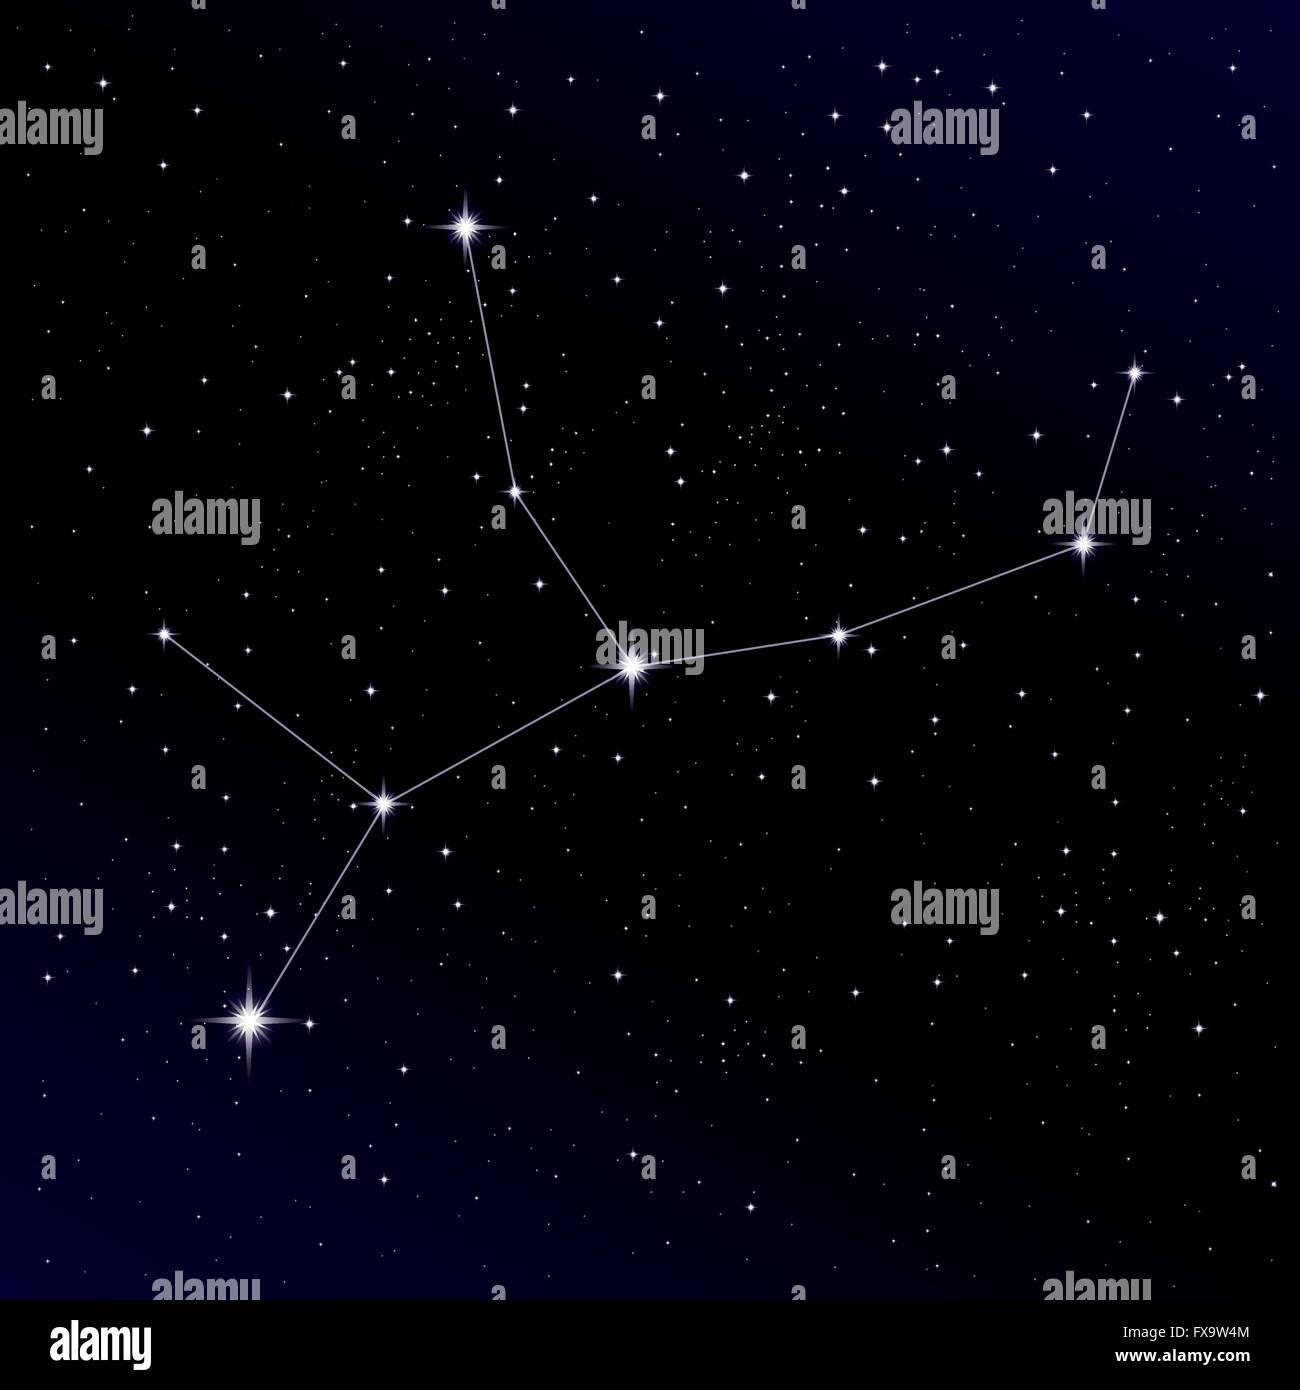 Virgo Constellation Stock Photos & Virgo Constellation ...